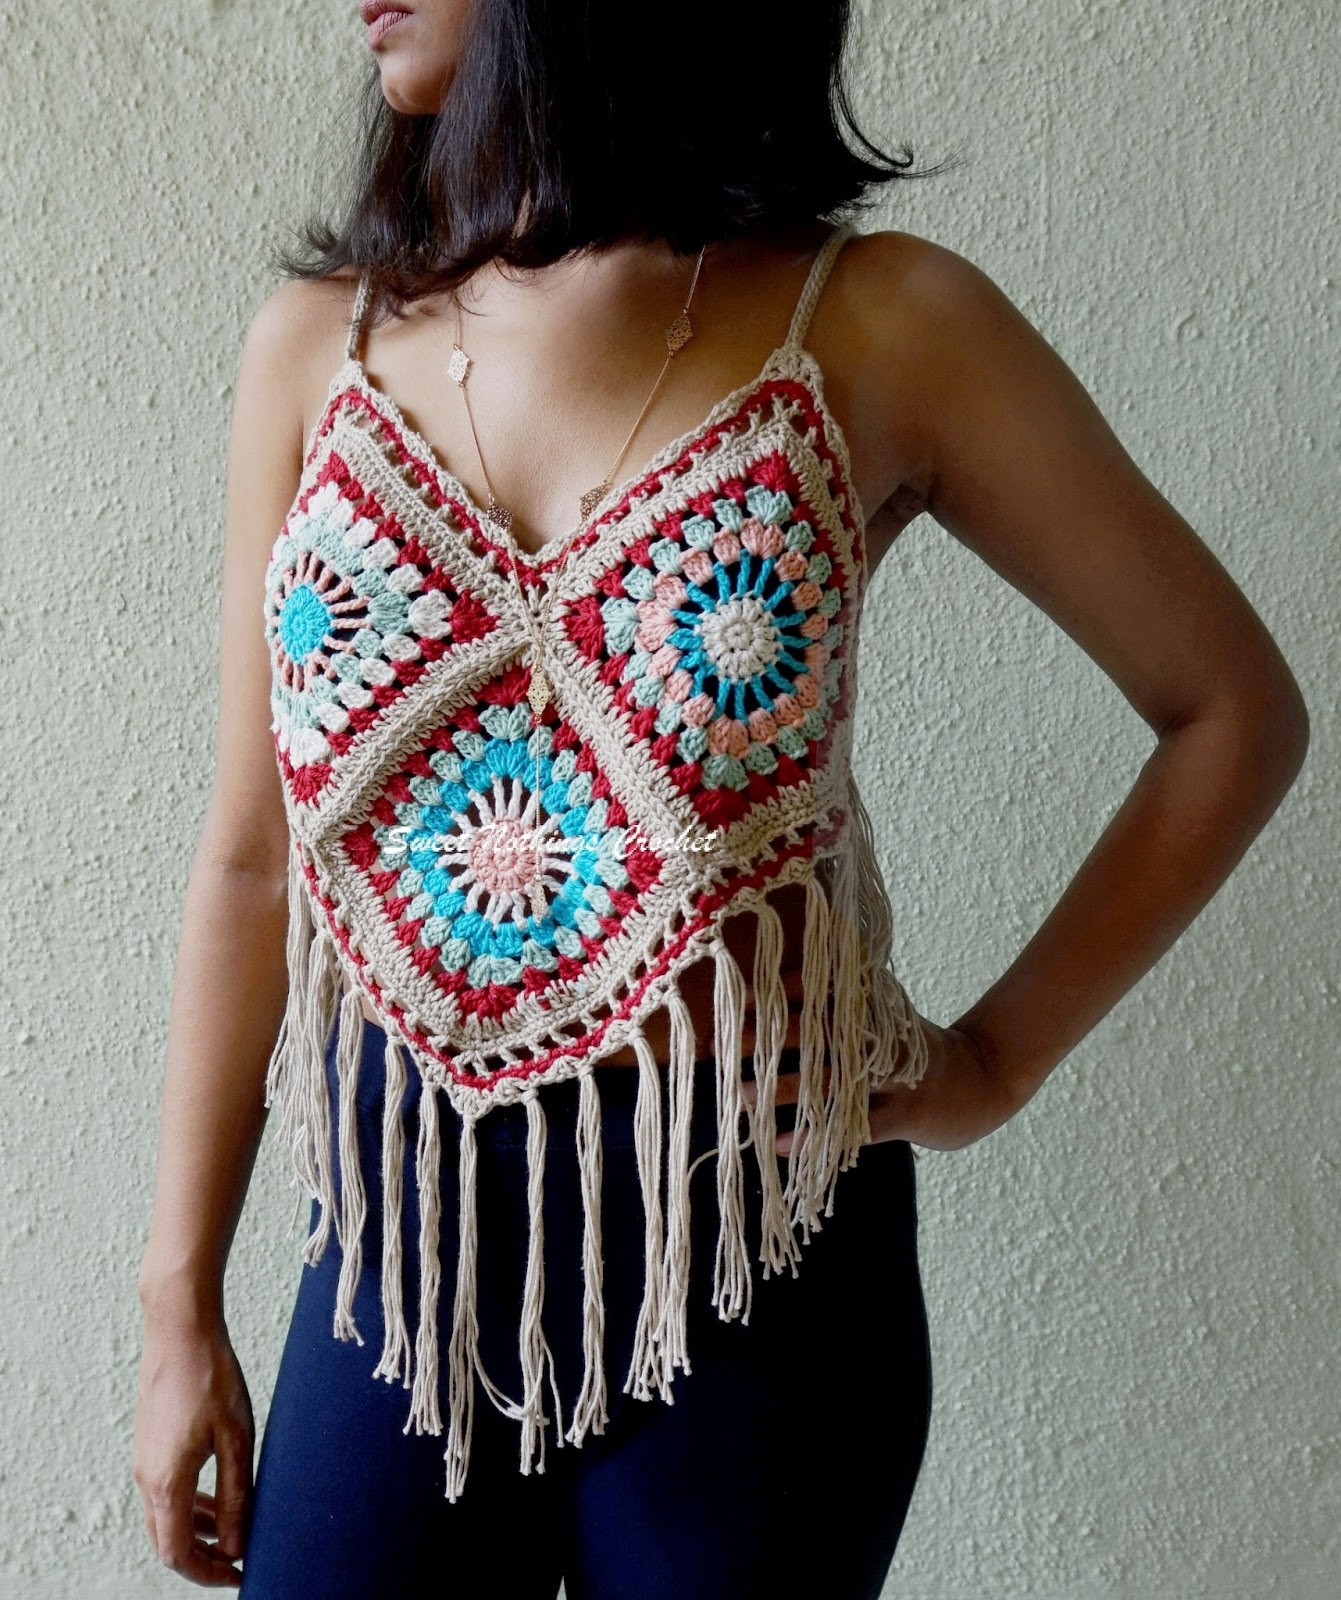 Sweet Nothings Crochet: GRANNY SQUARE BOHO / BEACH TOP